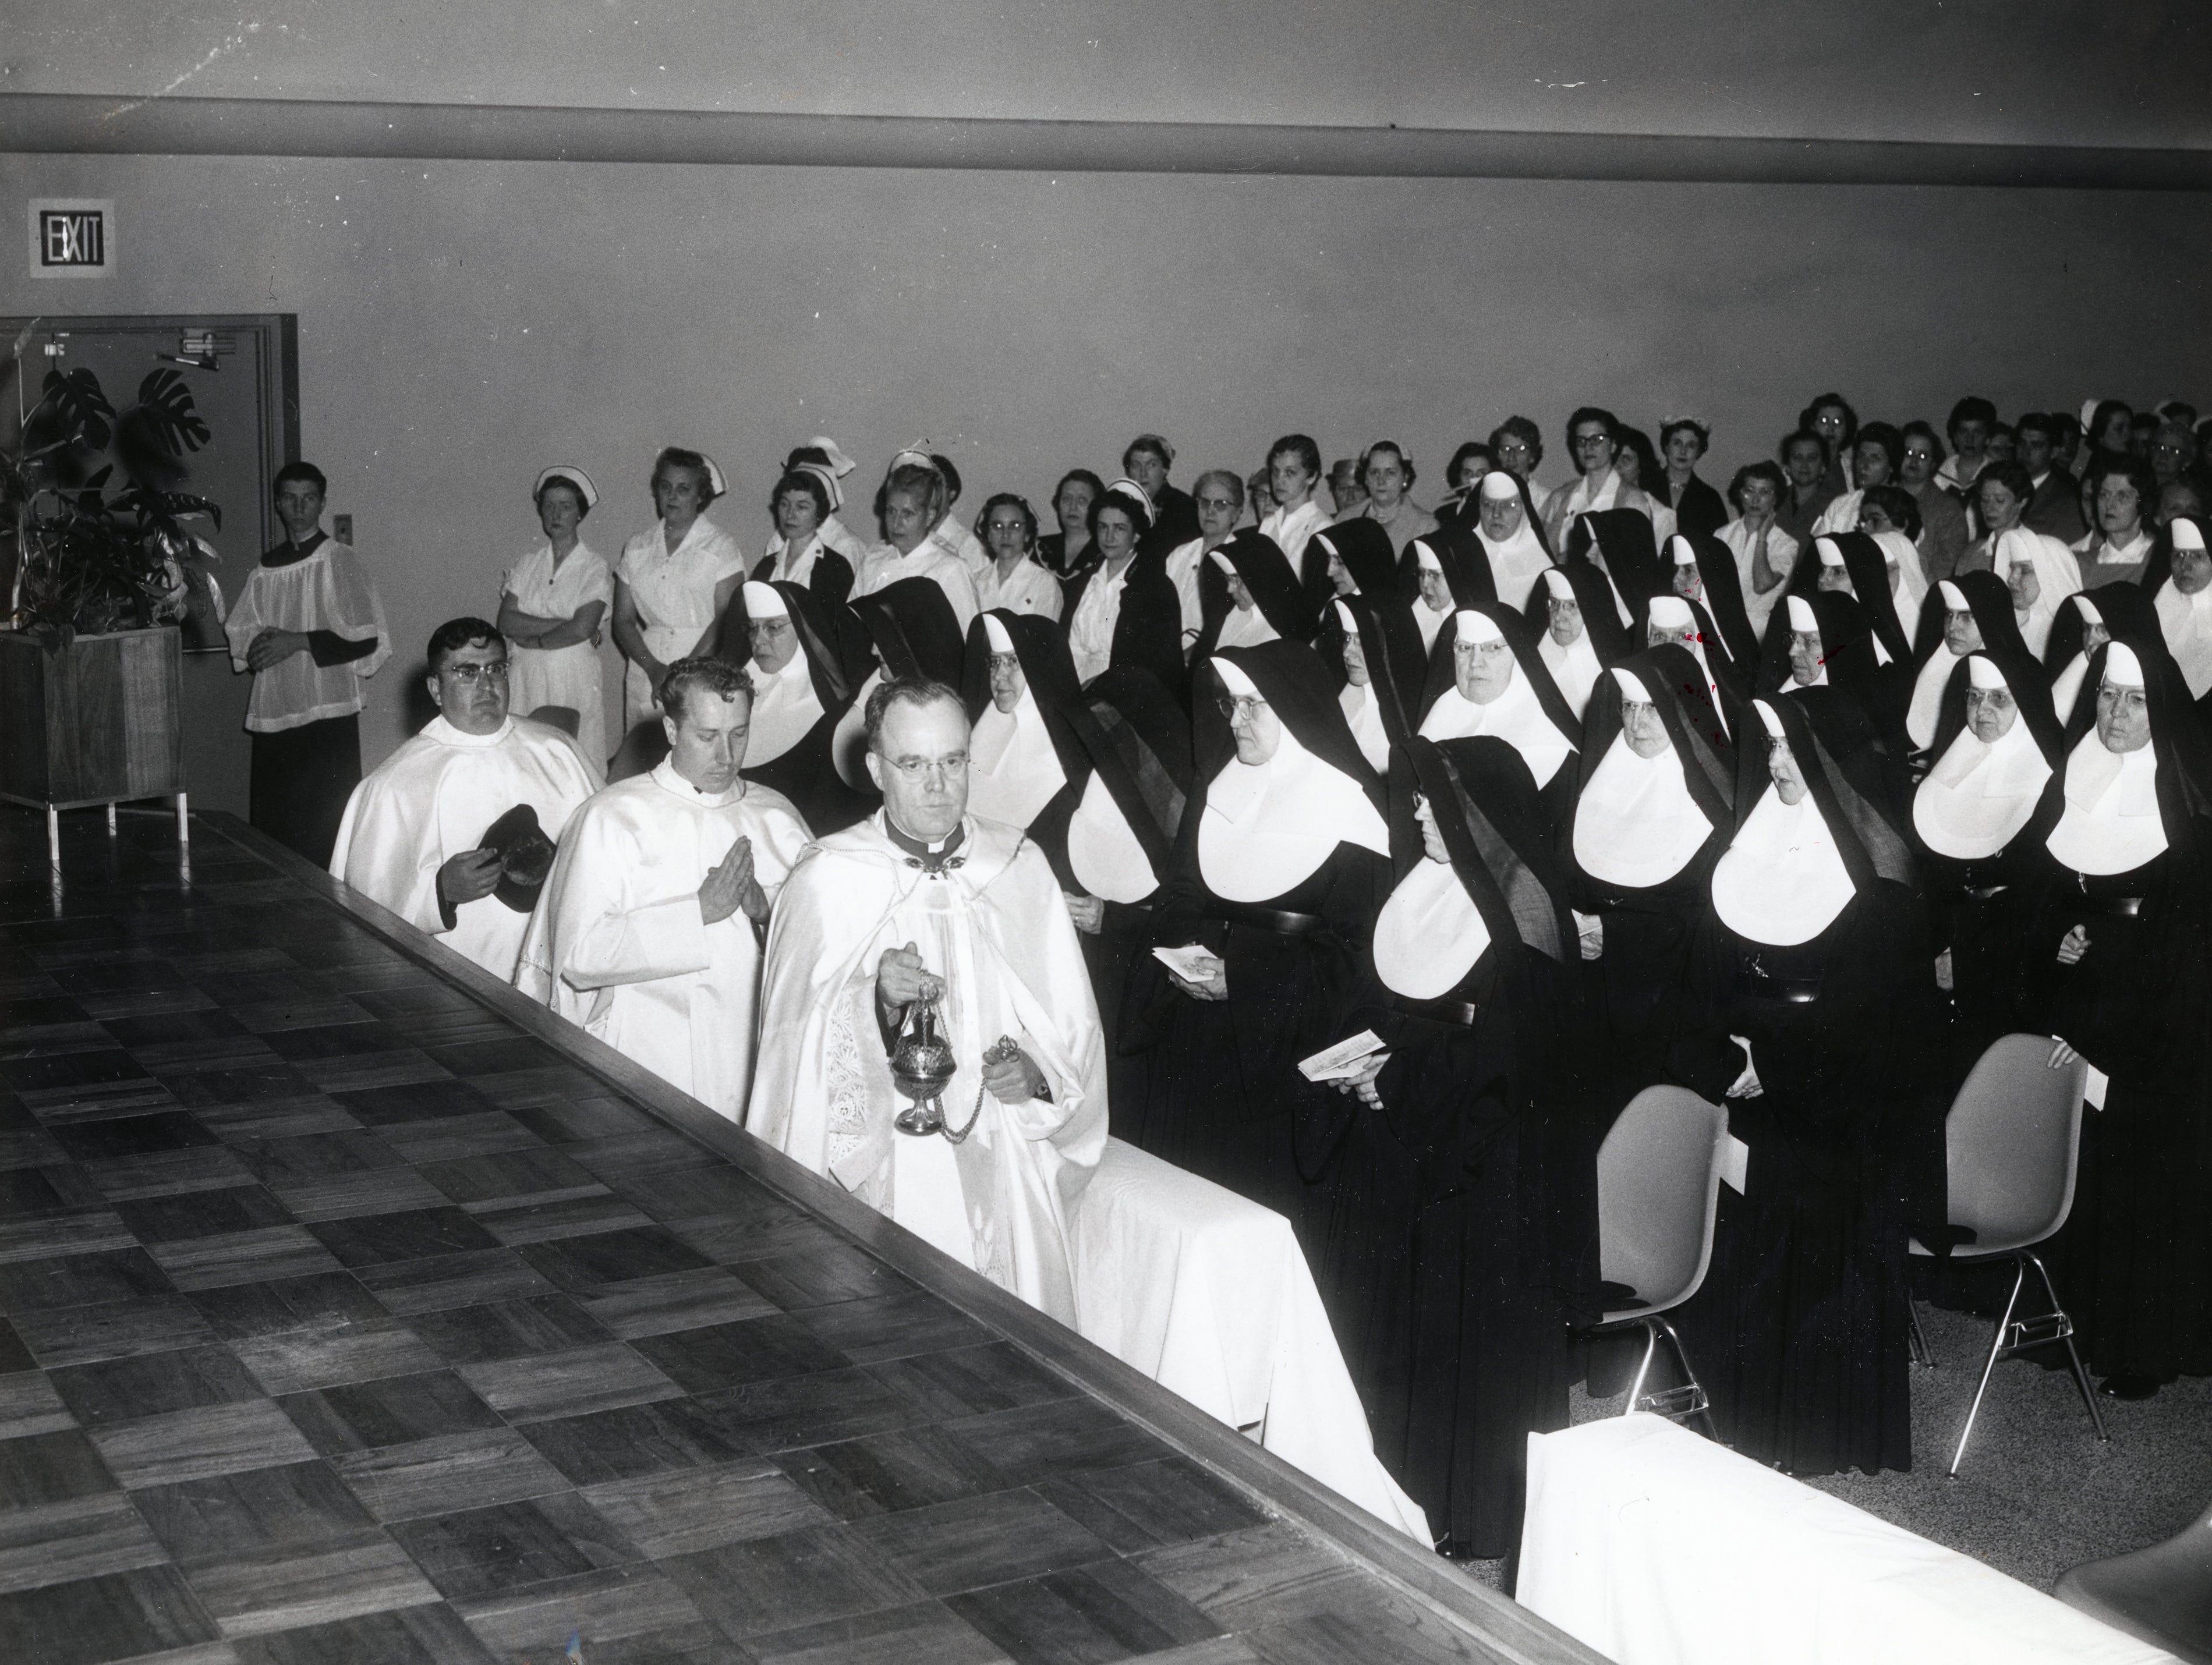 St. Mary's Hospital dedication in 1958.